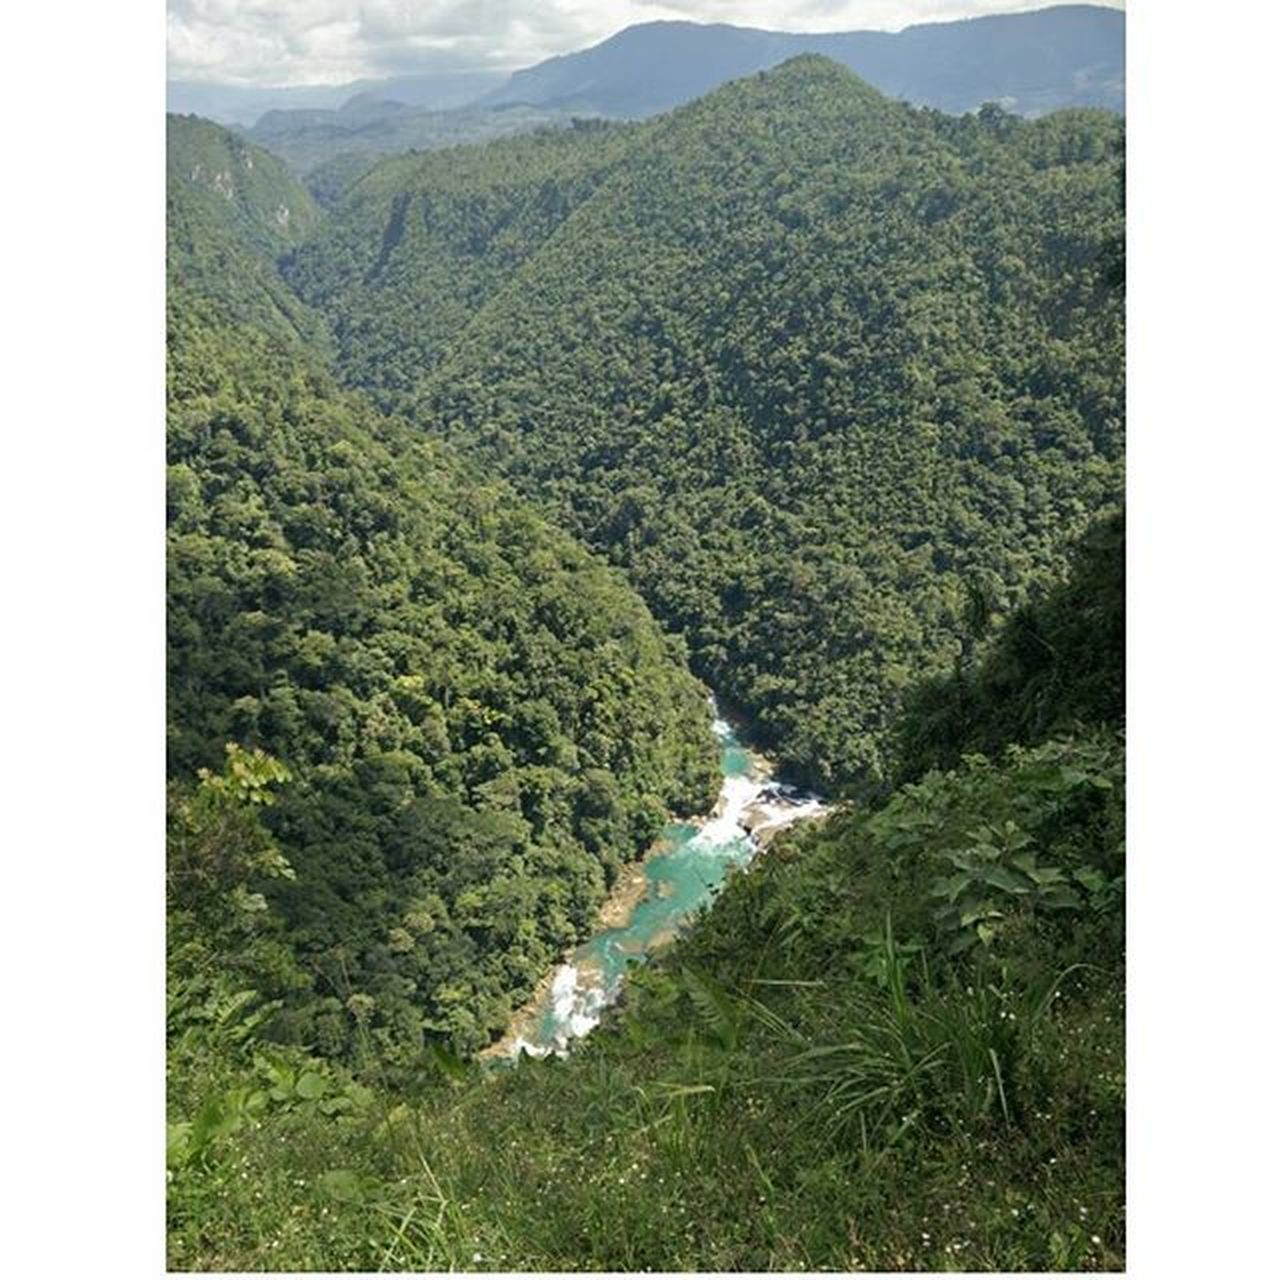 Montebello Cascadaojodeagua Chiapas Visitmexico 🇲🇽 Viveloparacreerlo Travel_learn_explore_the_world 🇲🇽 🇽Pasionxmexico ViveMexico Vive_mexico